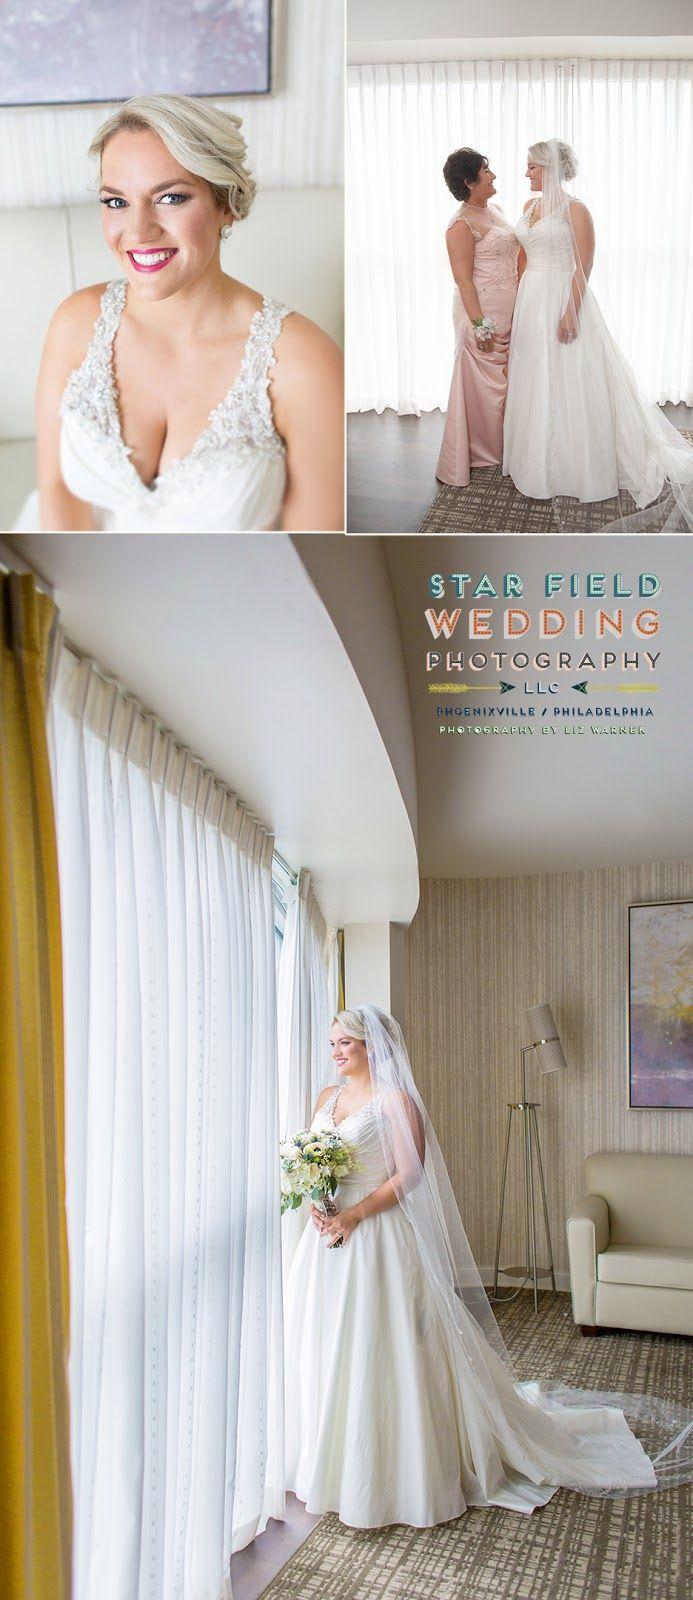 Philadelphia Wedding Photographer Blog - Liz Warnek Photography - Phoenixville Wedding Photographer : Caitlin and Pat's Wedding - Springfield Country Club and St. Coleman's church Ardmore #SpringfieldCountryClub  #SpringfieldCountryClub Wedding #MarriottSpringfieldCountryClub  #MarriottSpringfieldCountryClubBridalSuite